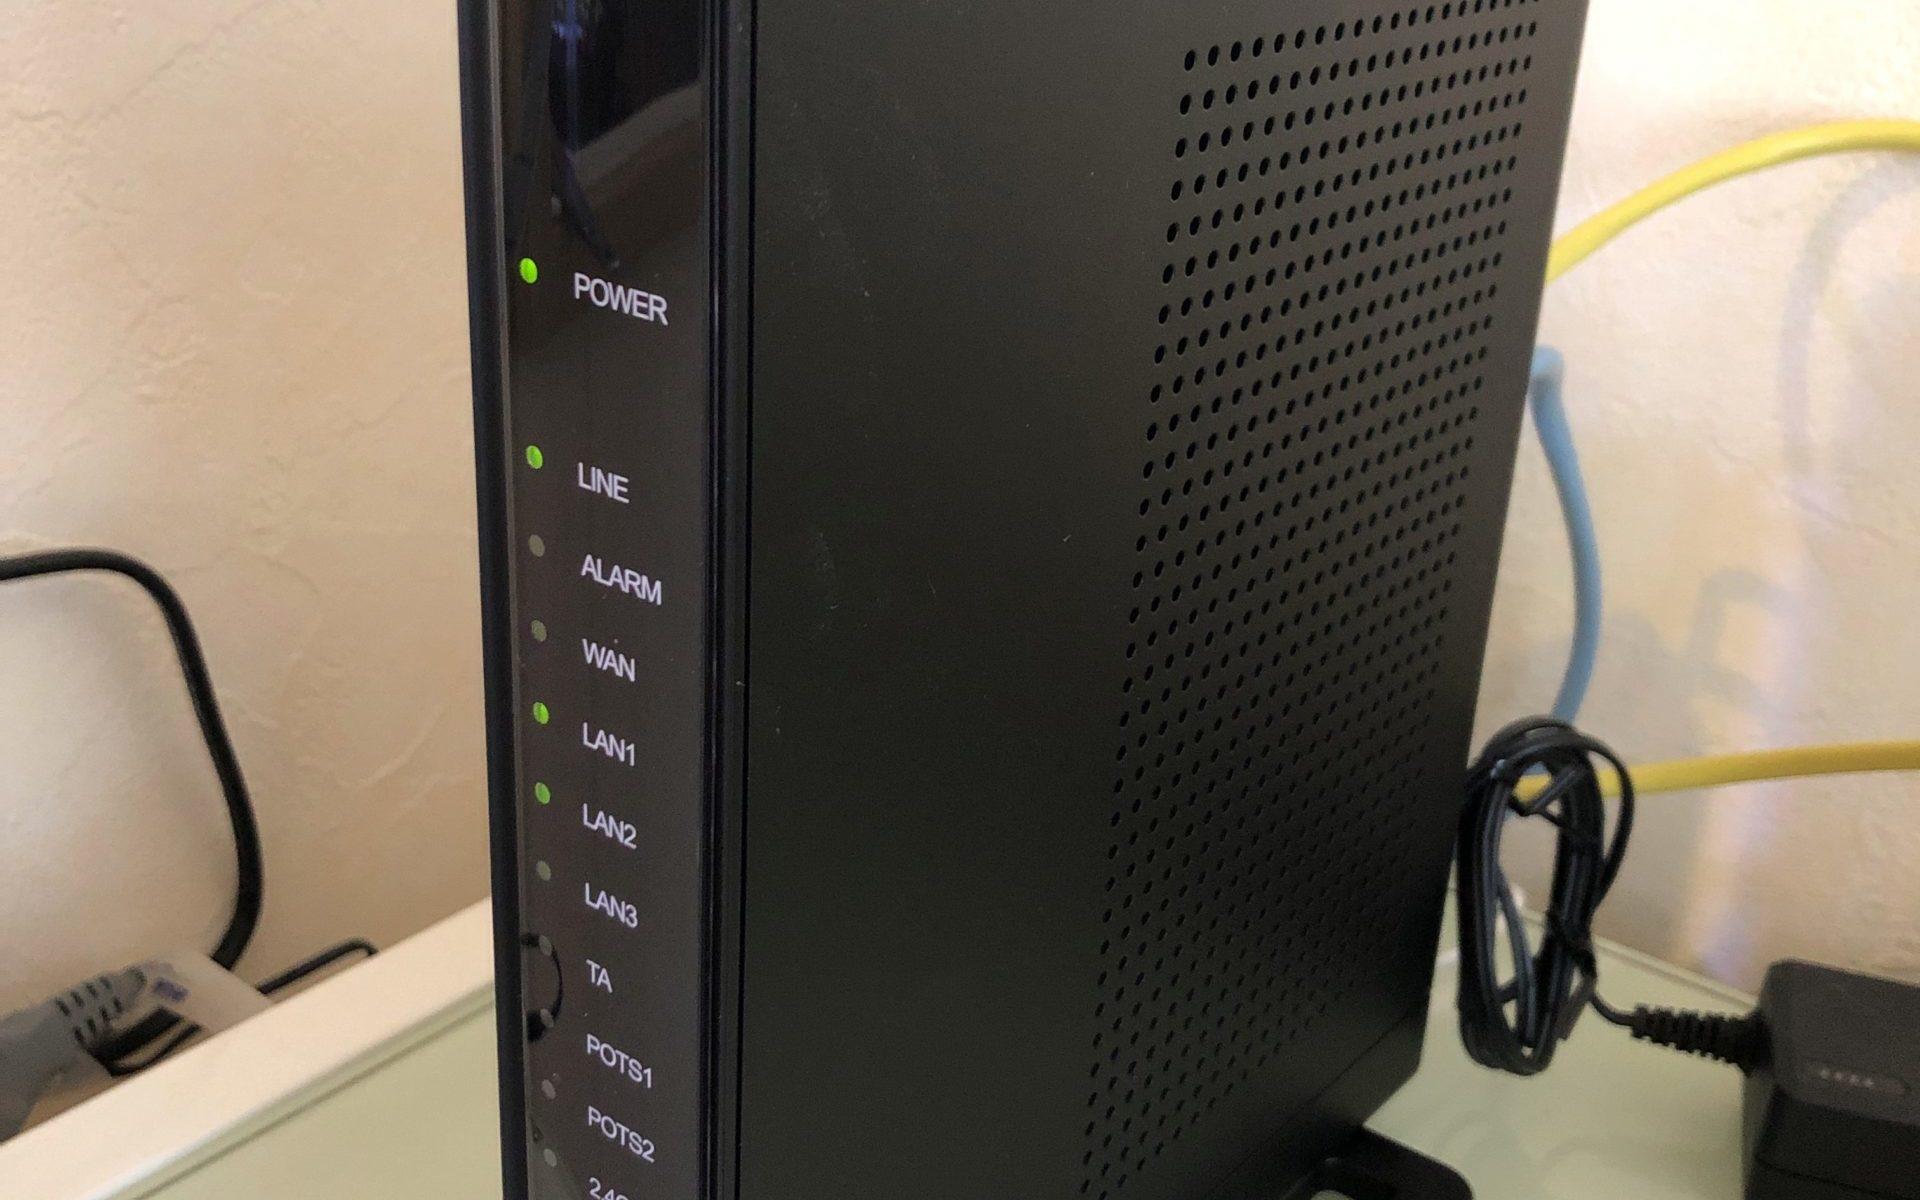 NURO光の光回線終端装置(ONU)。ZTE社のF660Aです。形状がシンプルな四角なので置き場にも困らない。縦置きで使うようマニュアルに記載されています。